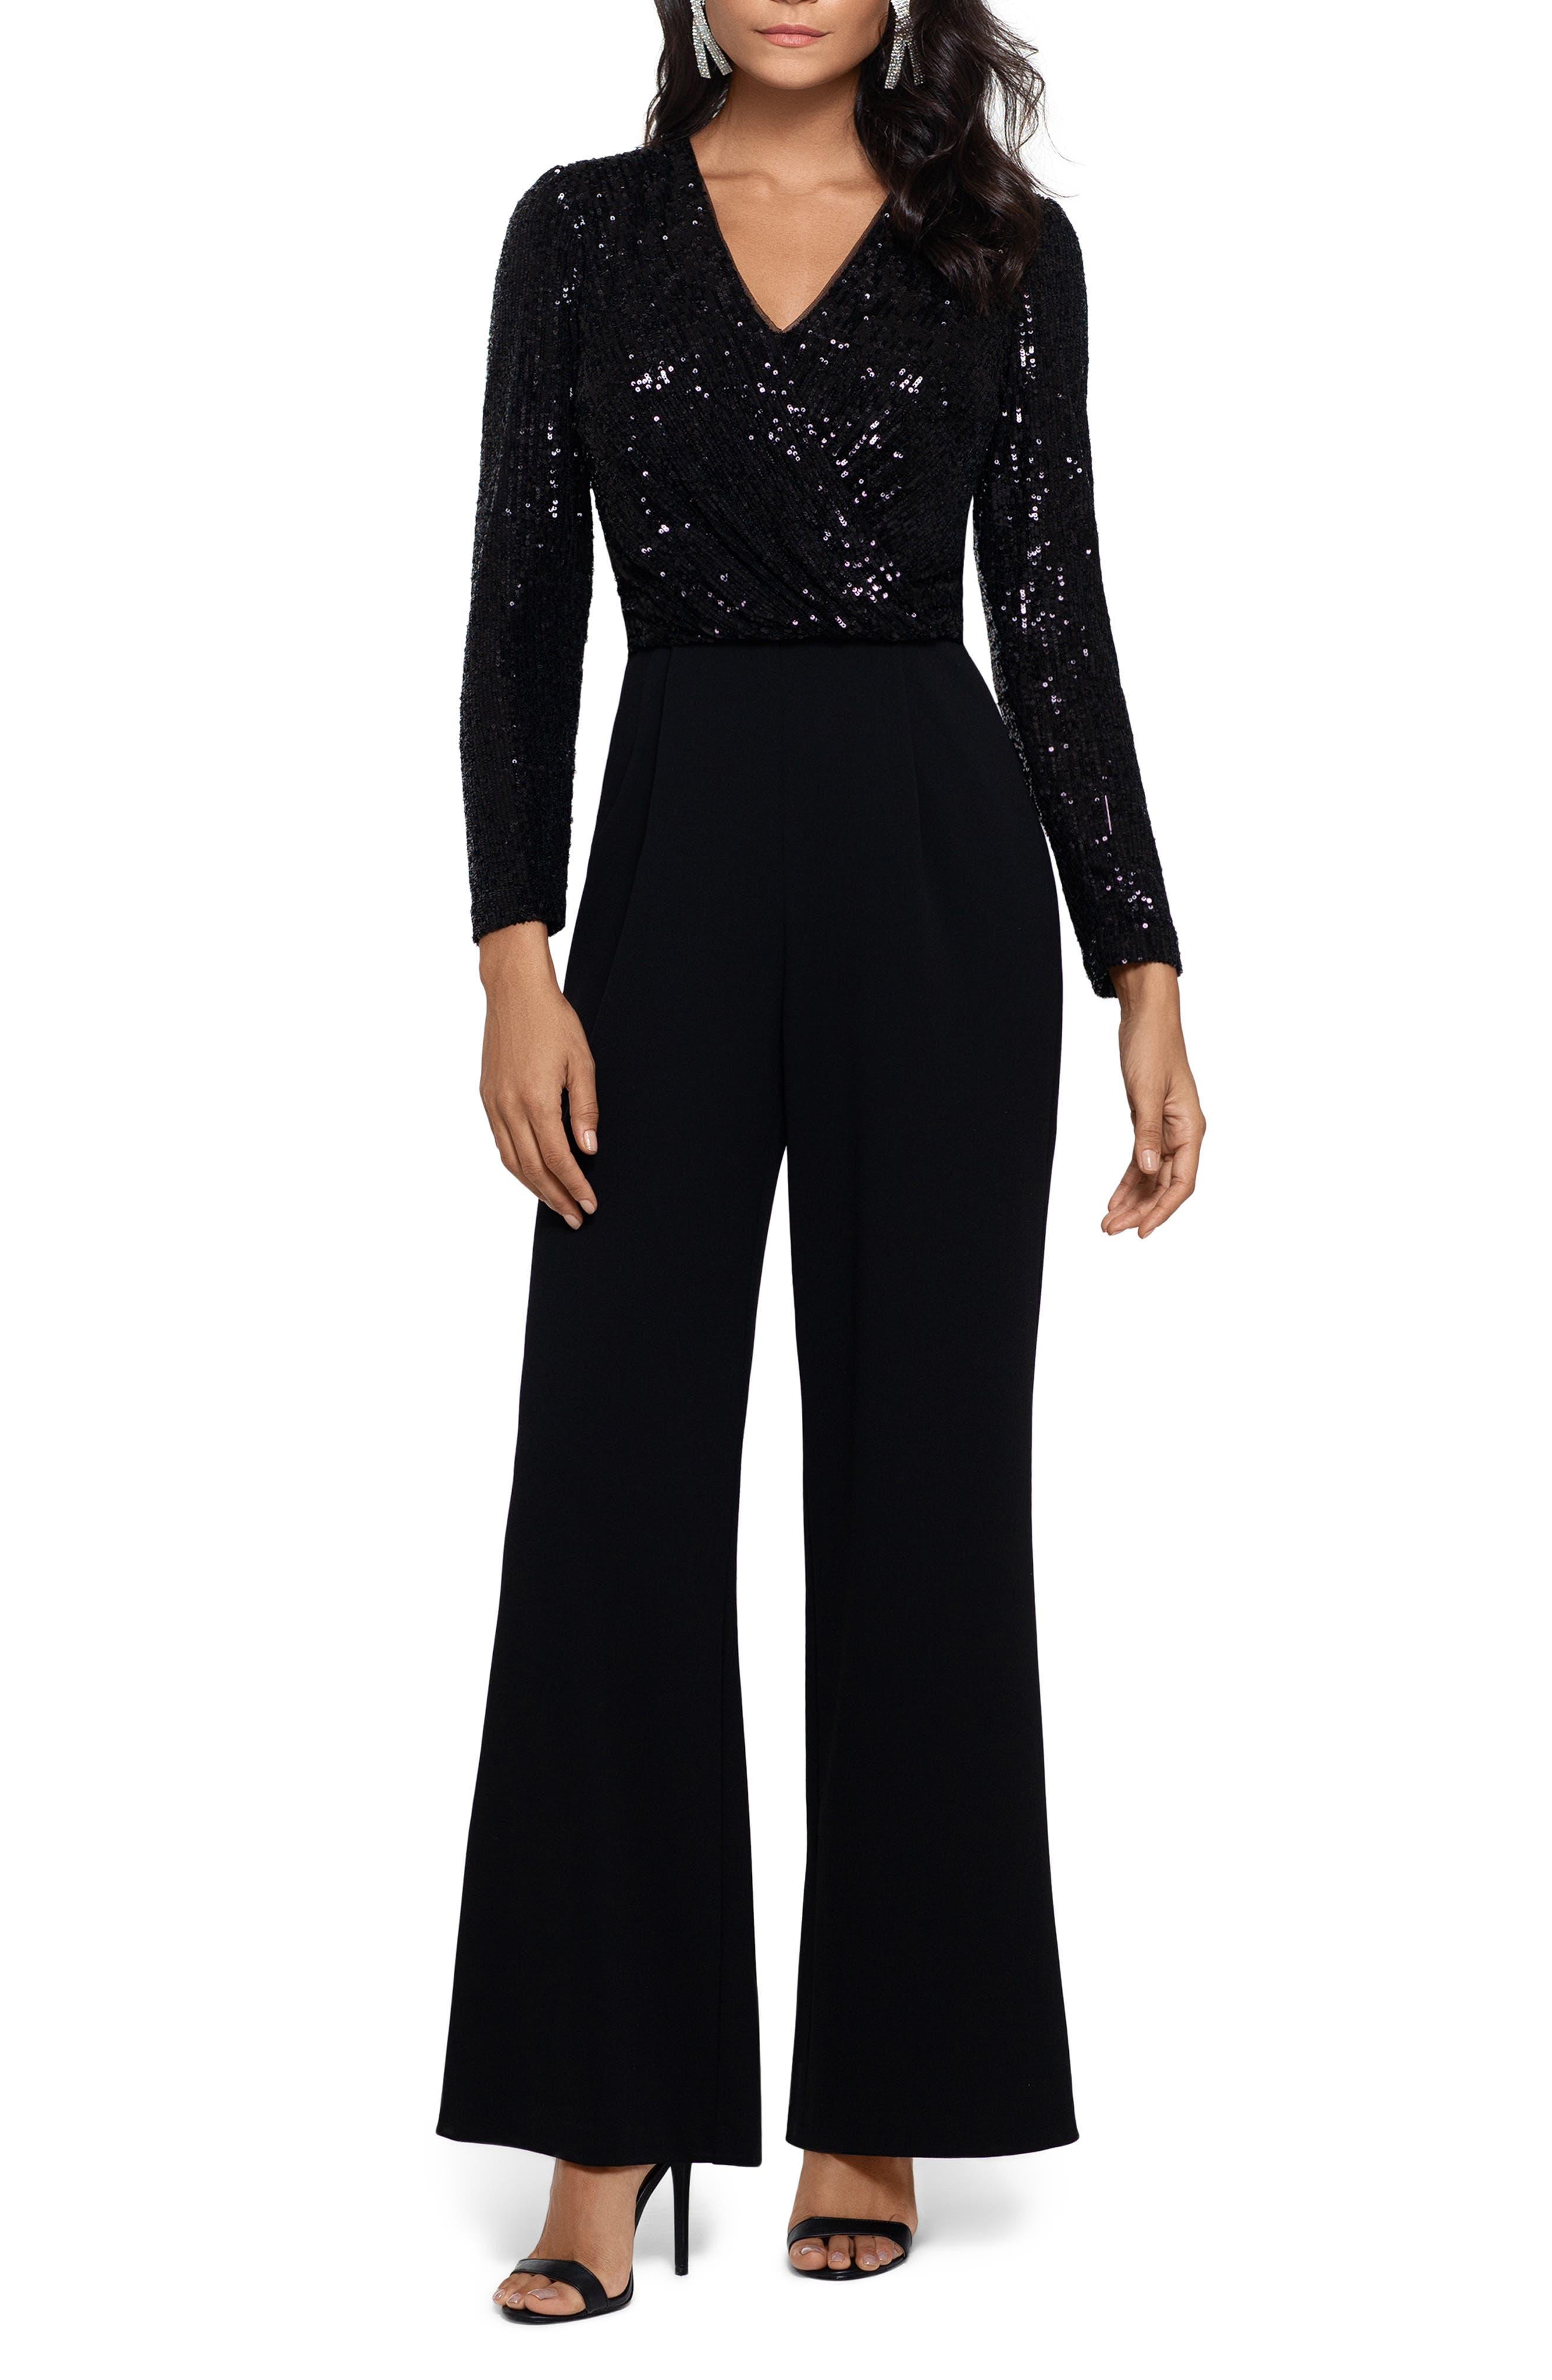 70s Prom, Formal, Evening, Party Dresses Womens Xscape Sequin Long Sleeve Crepe Jumpsuit Size 16 - Black $258.00 AT vintagedancer.com